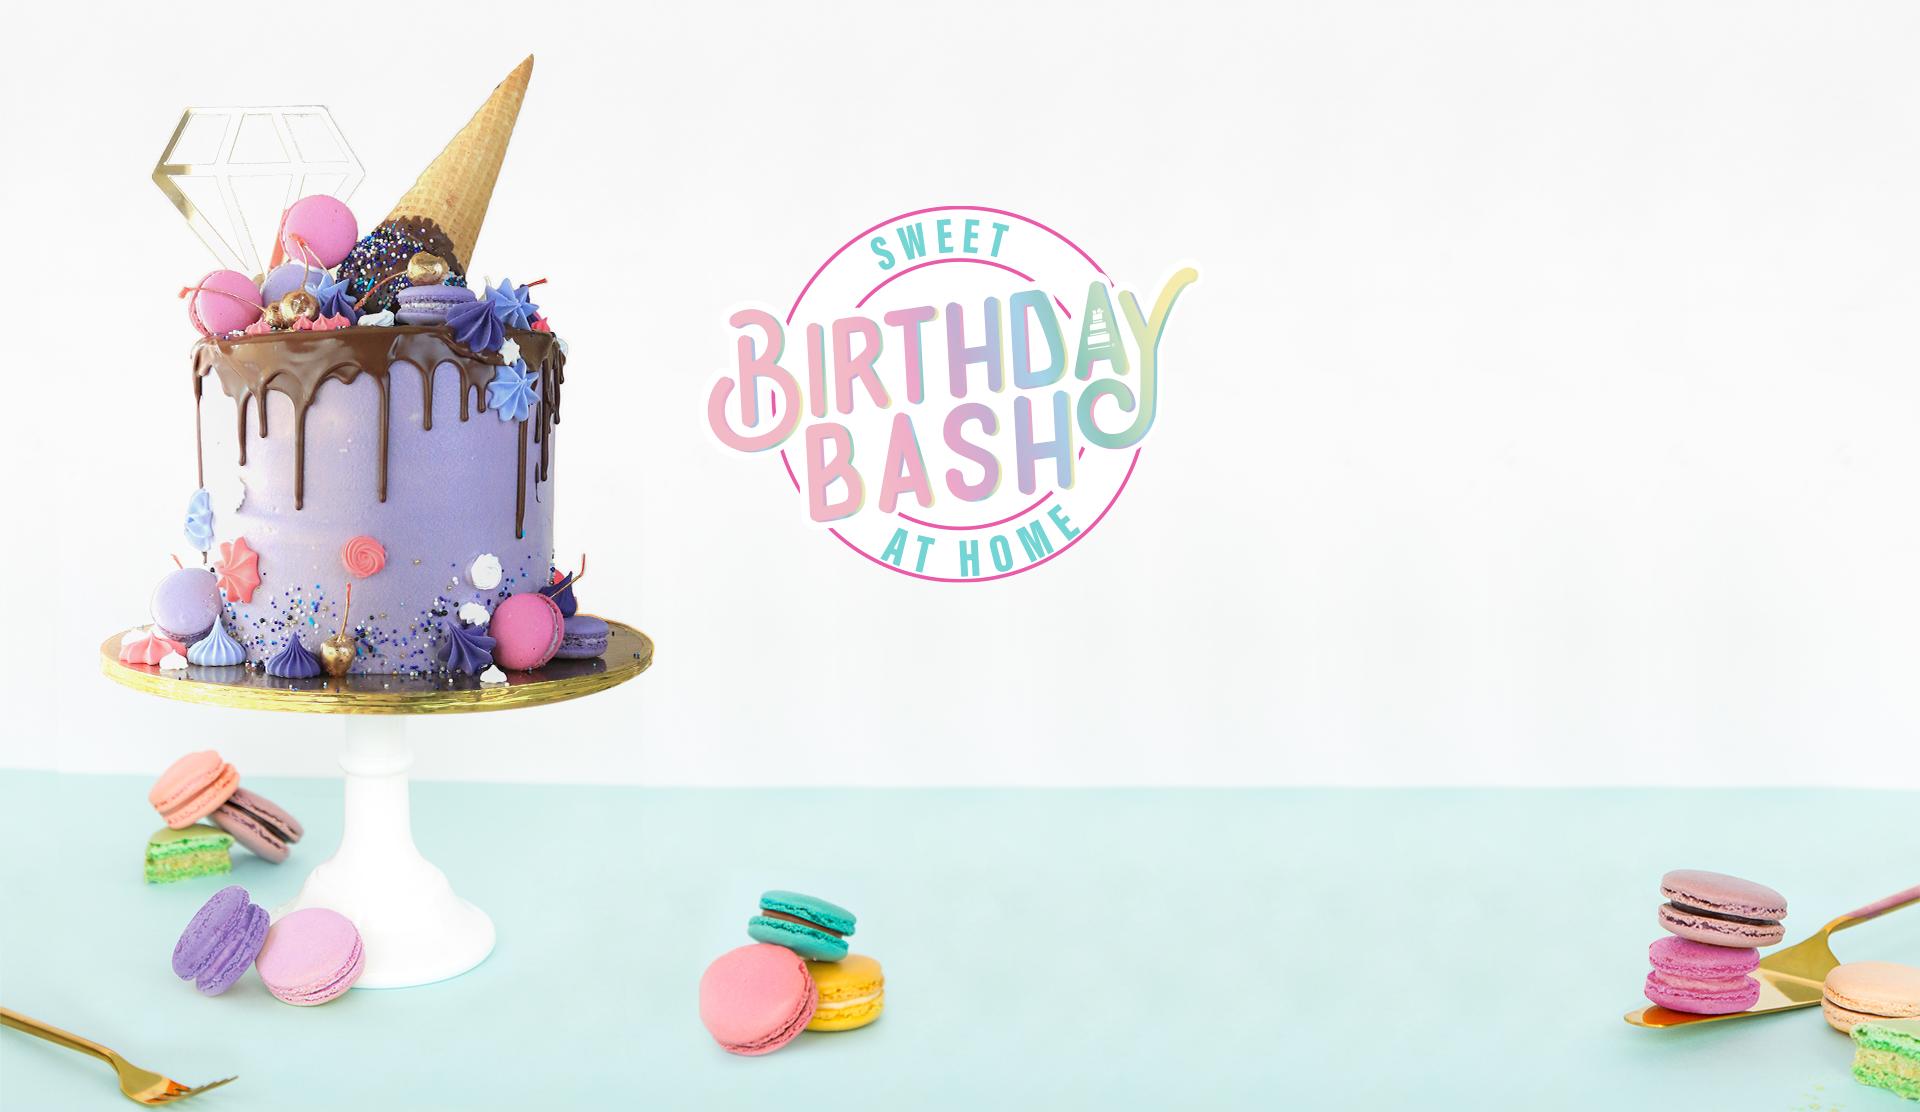 Sweet Birthday Bash at Home